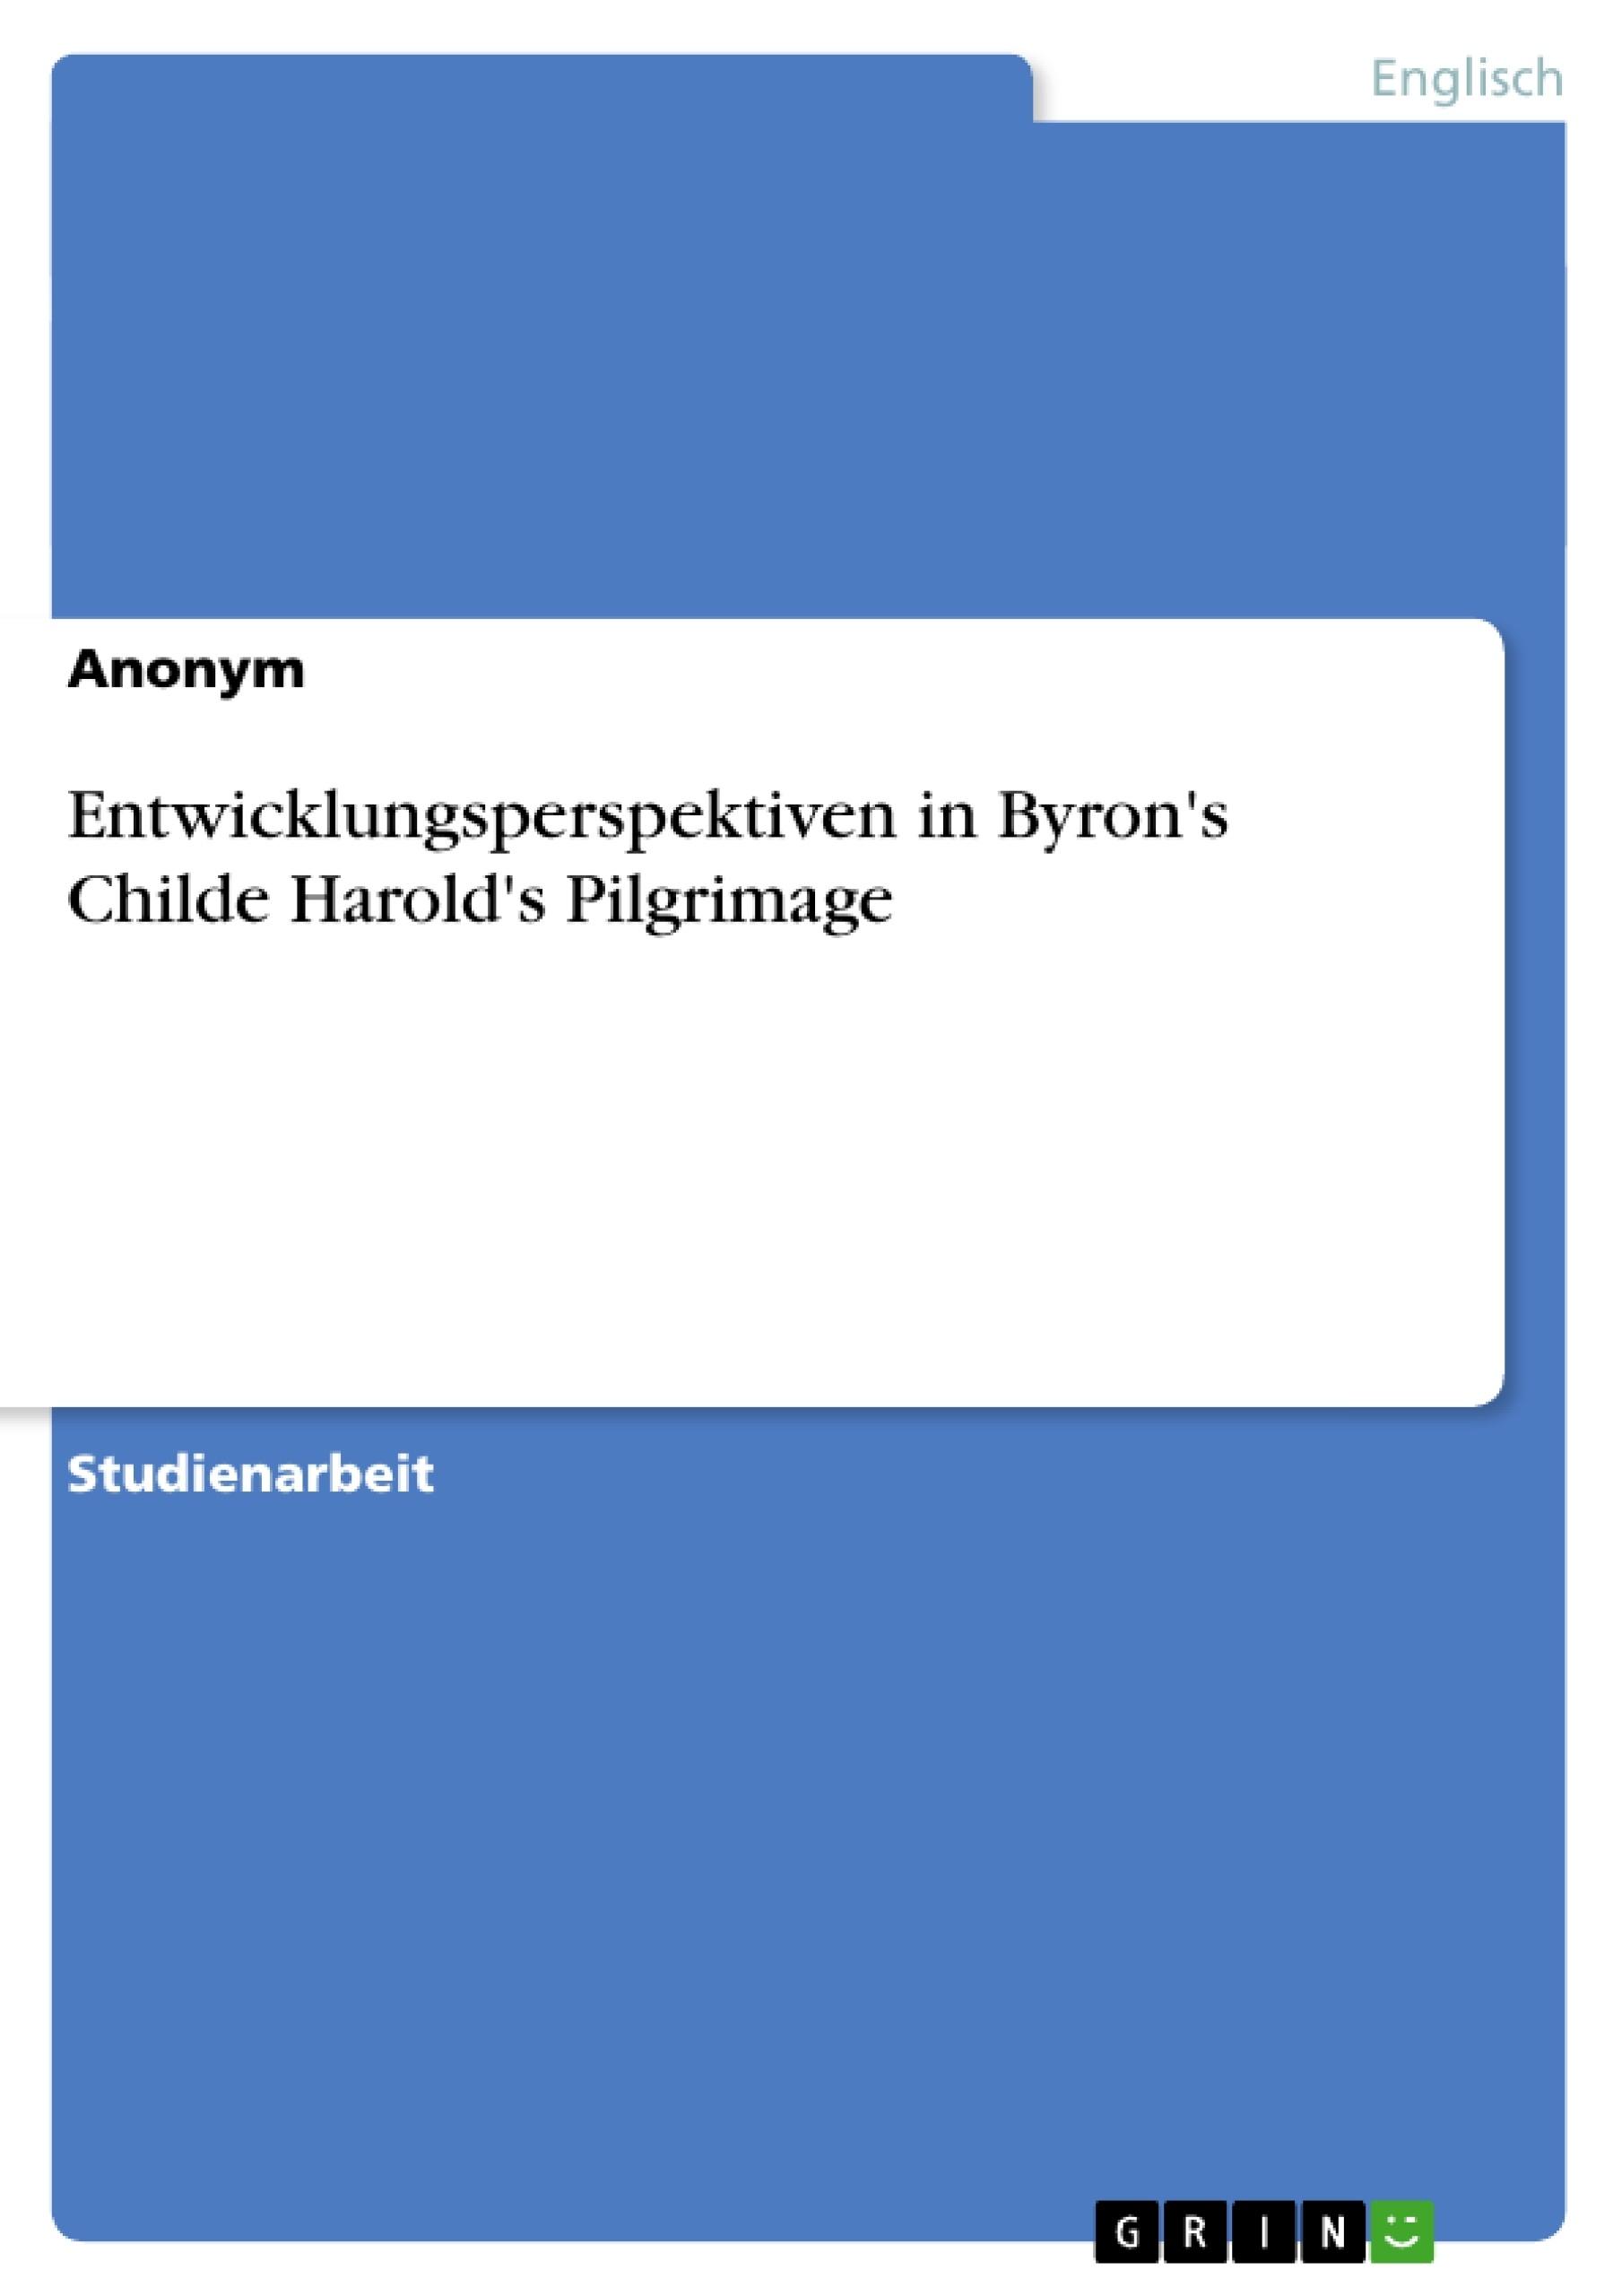 Titel: Entwicklungsperspektiven in Byron's Childe Harold's Pilgrimage